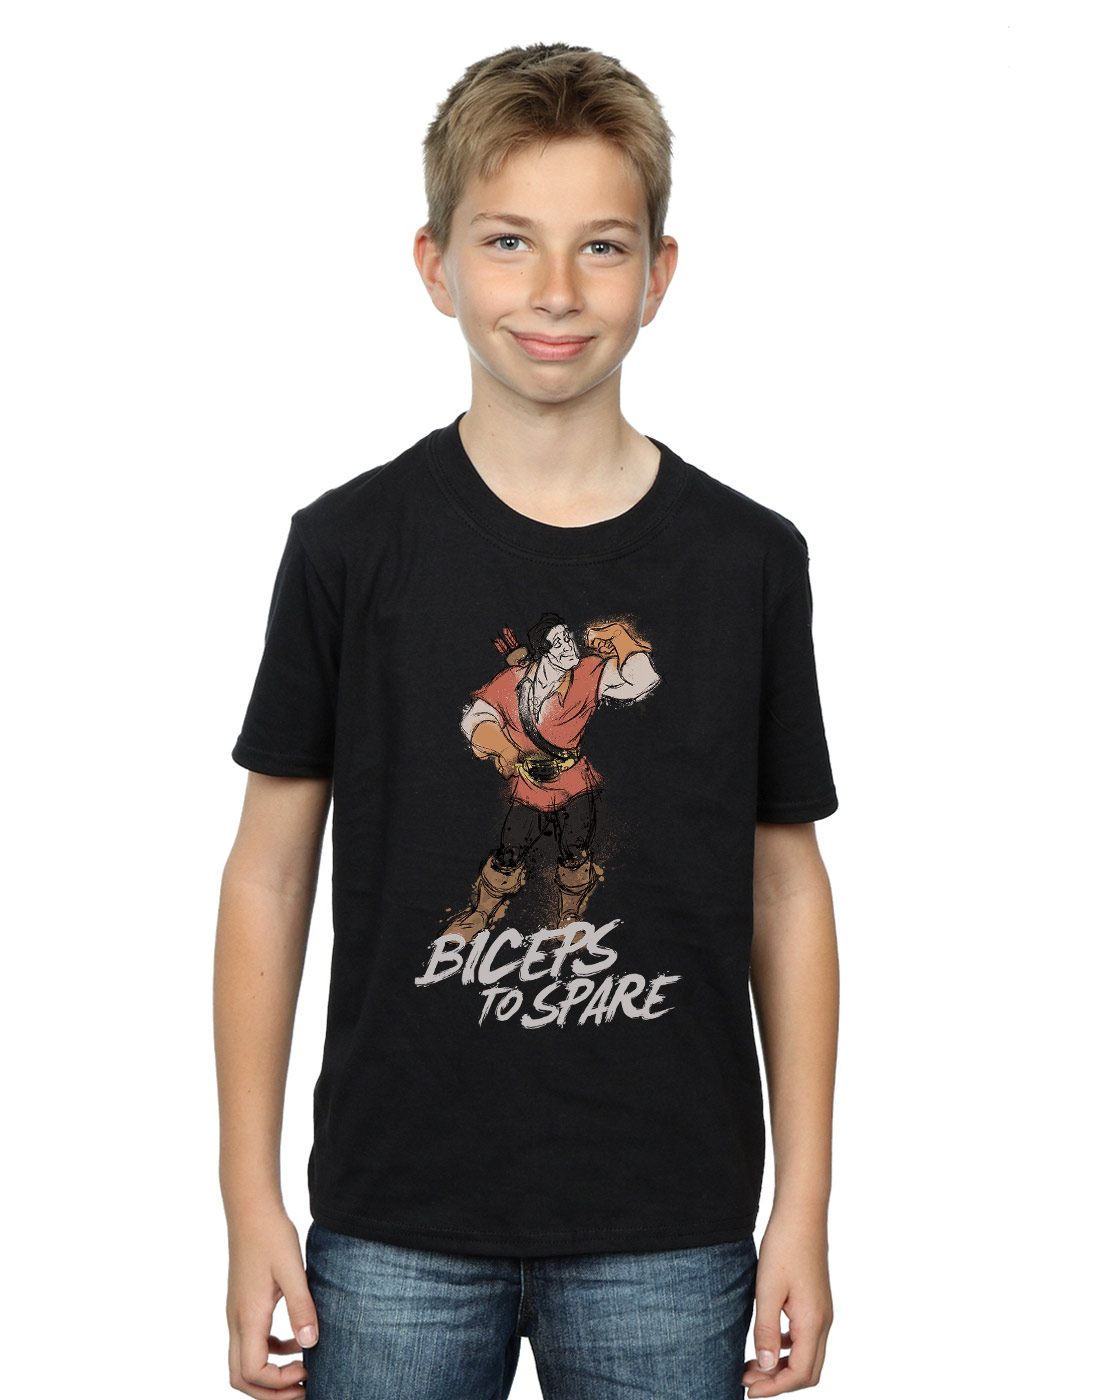 Disney Beauty And The Beast Cartoon Pixar Unisex Kids White Birthday T Shirt 246